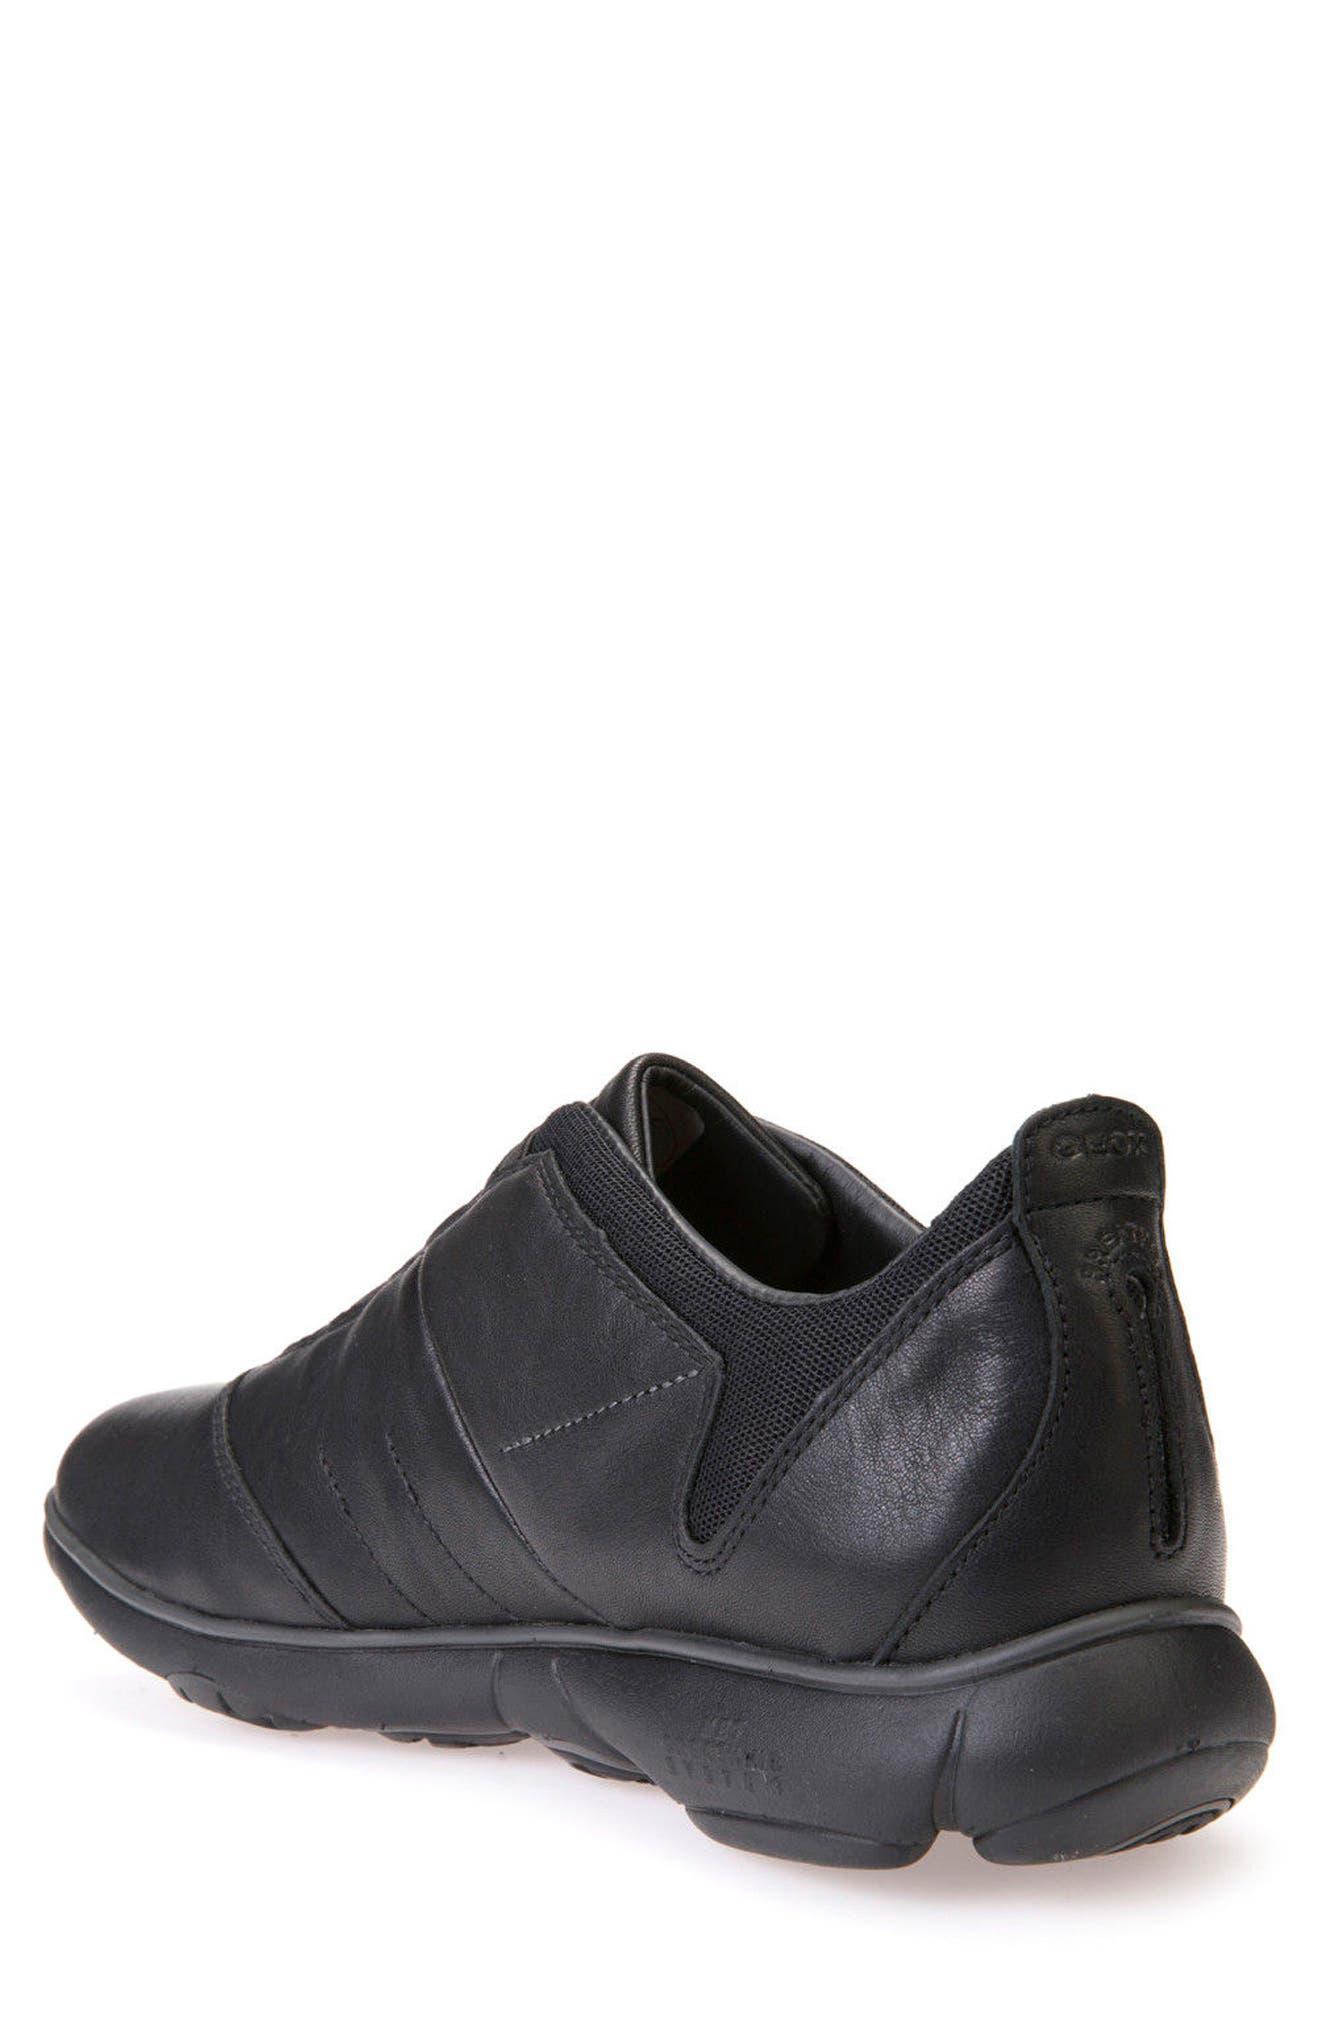 'Nebula 8' Sneaker,                             Alternate thumbnail 2, color,                             BLACK